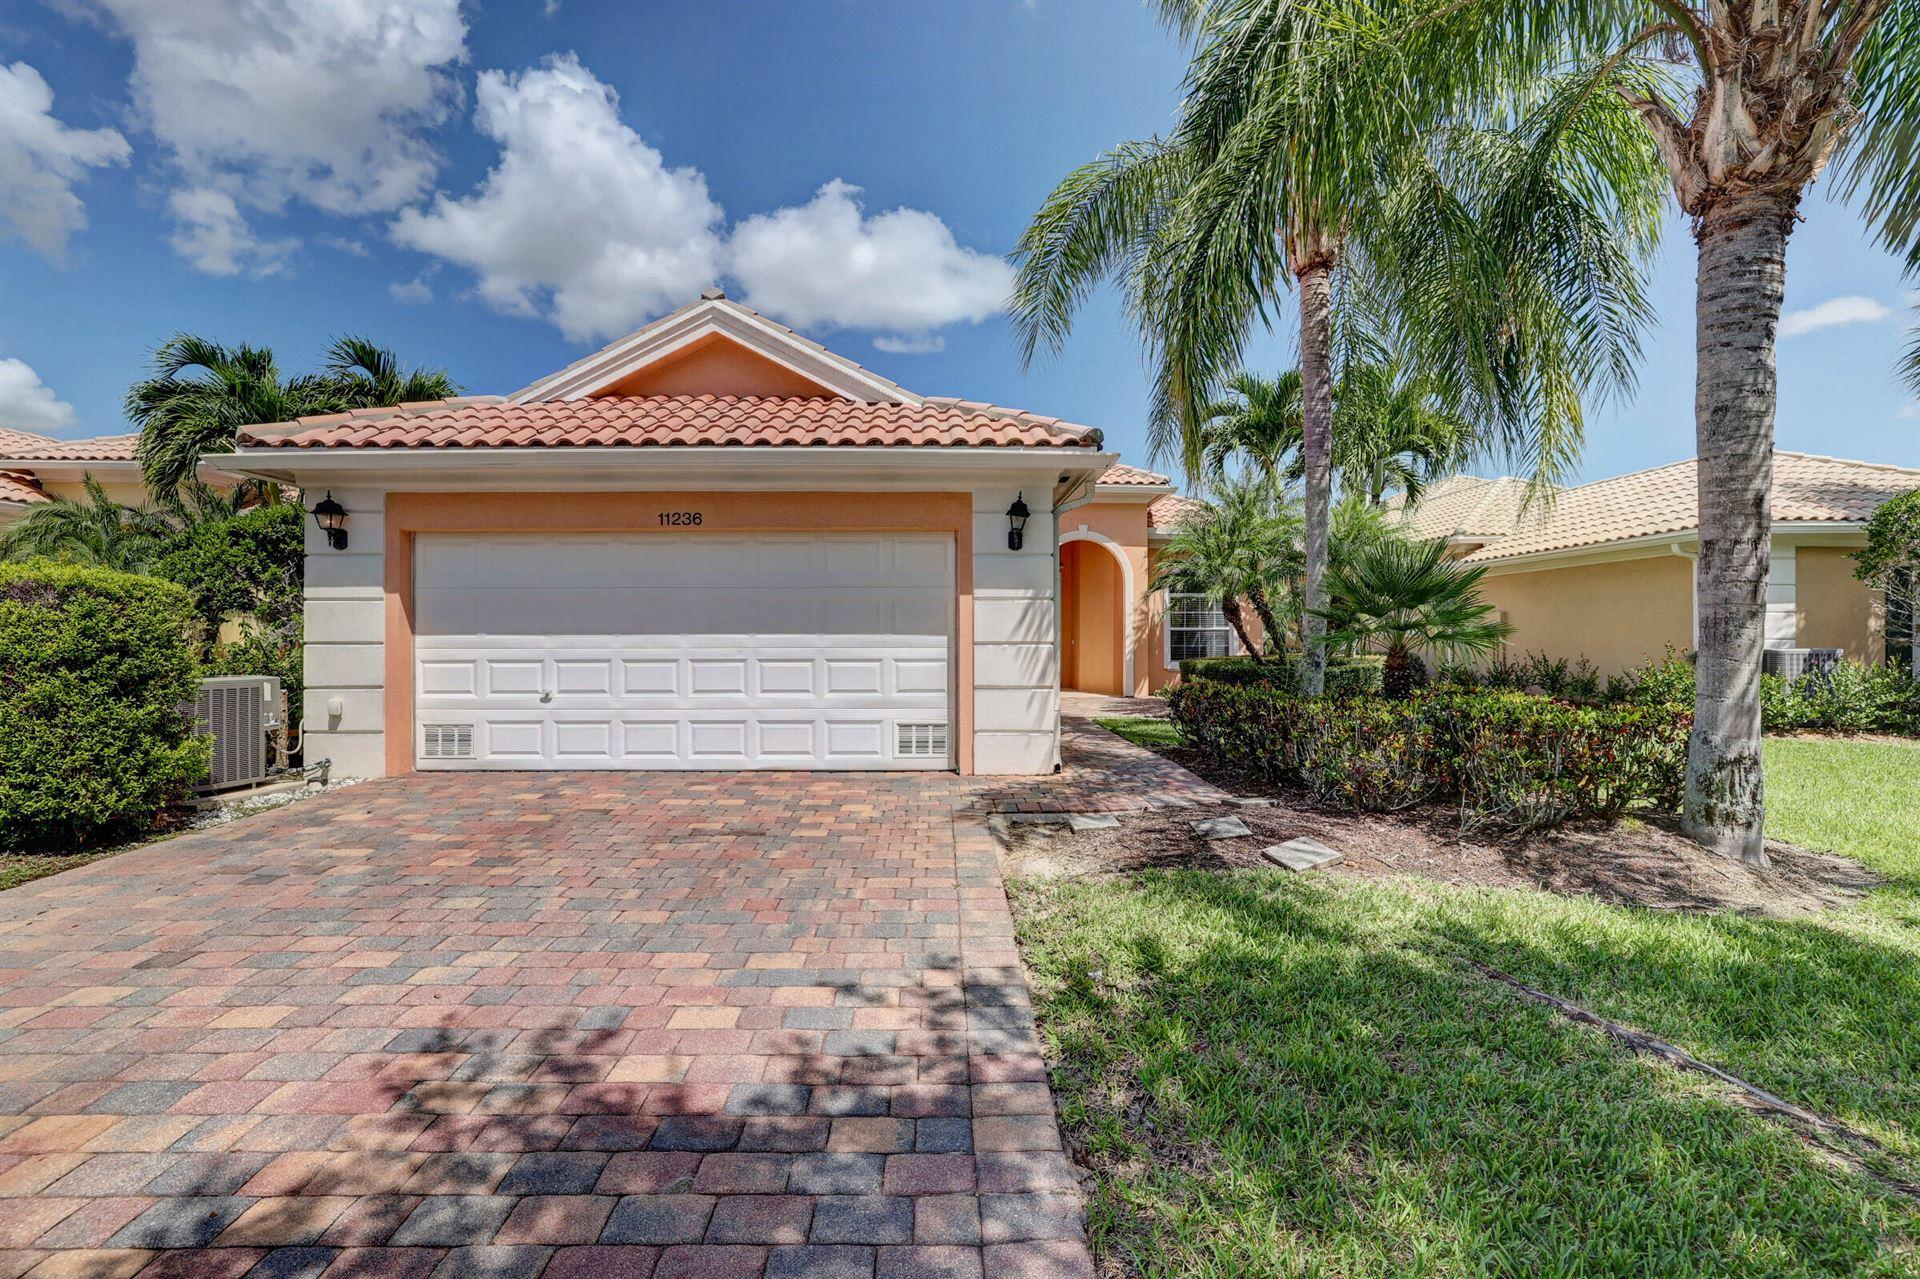 11236 SW Northland Drive, Port Saint Lucie, FL 34987 - #: RX-10746320